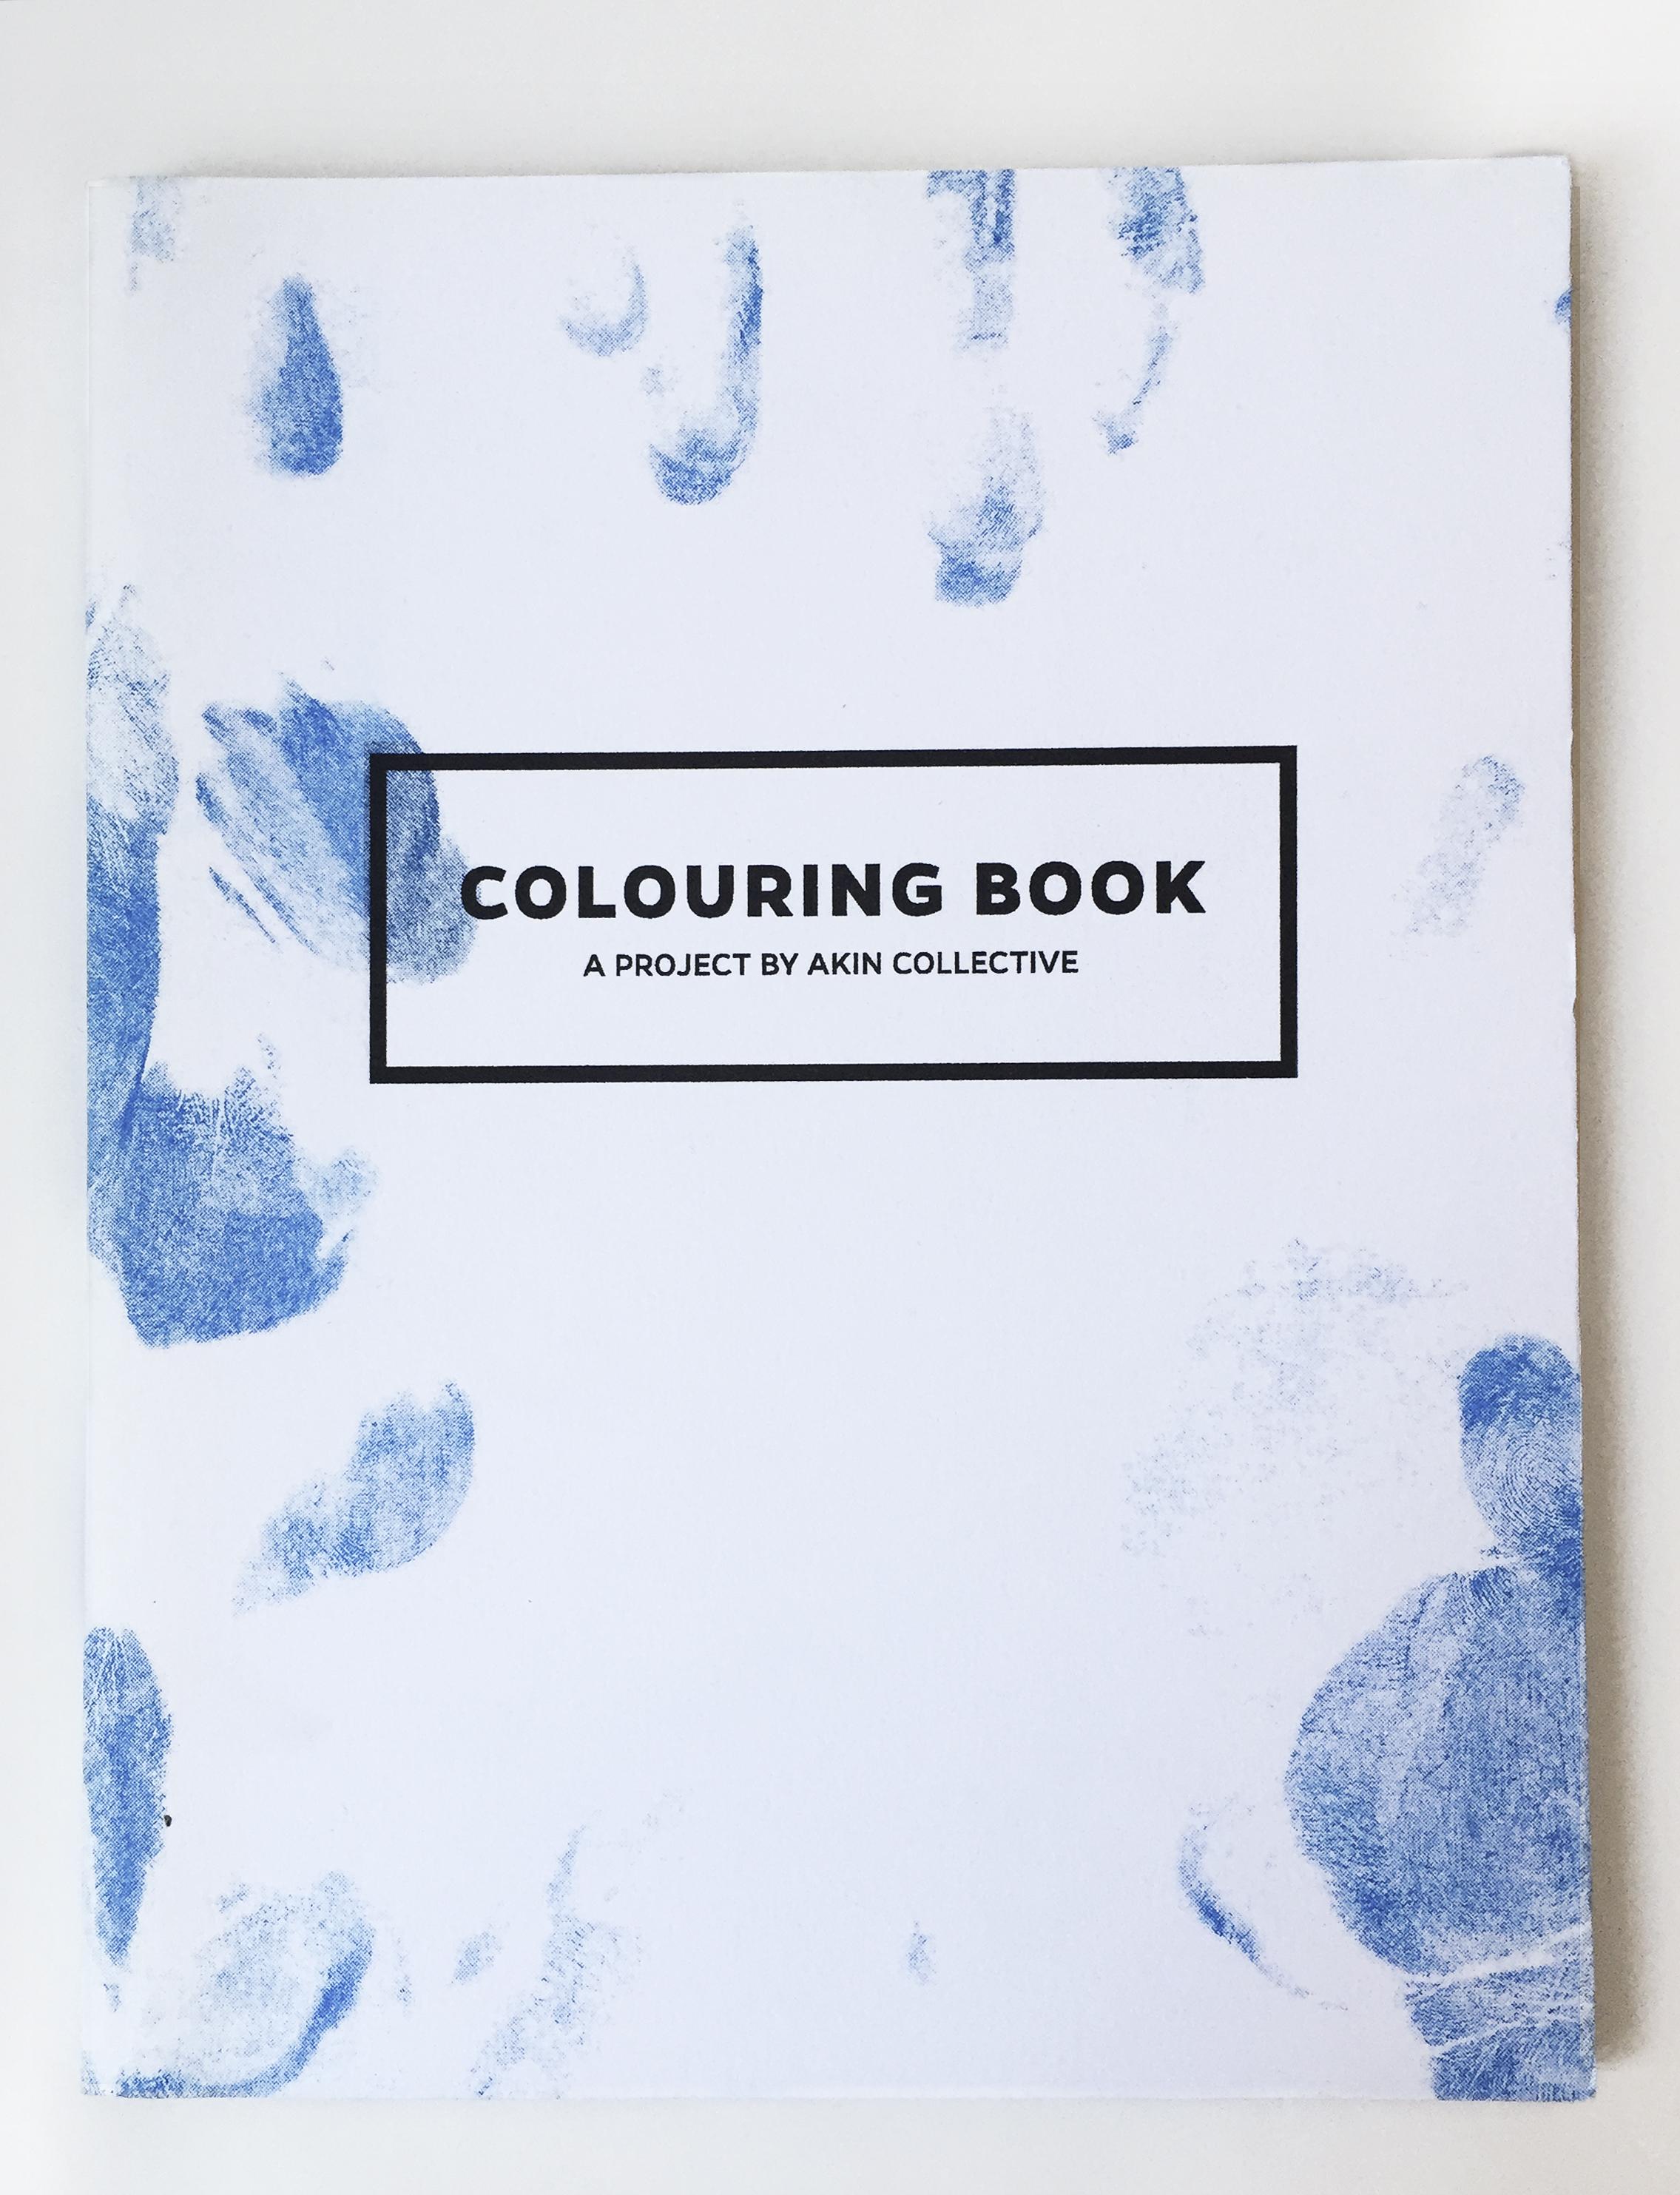 colouringbook.jpg